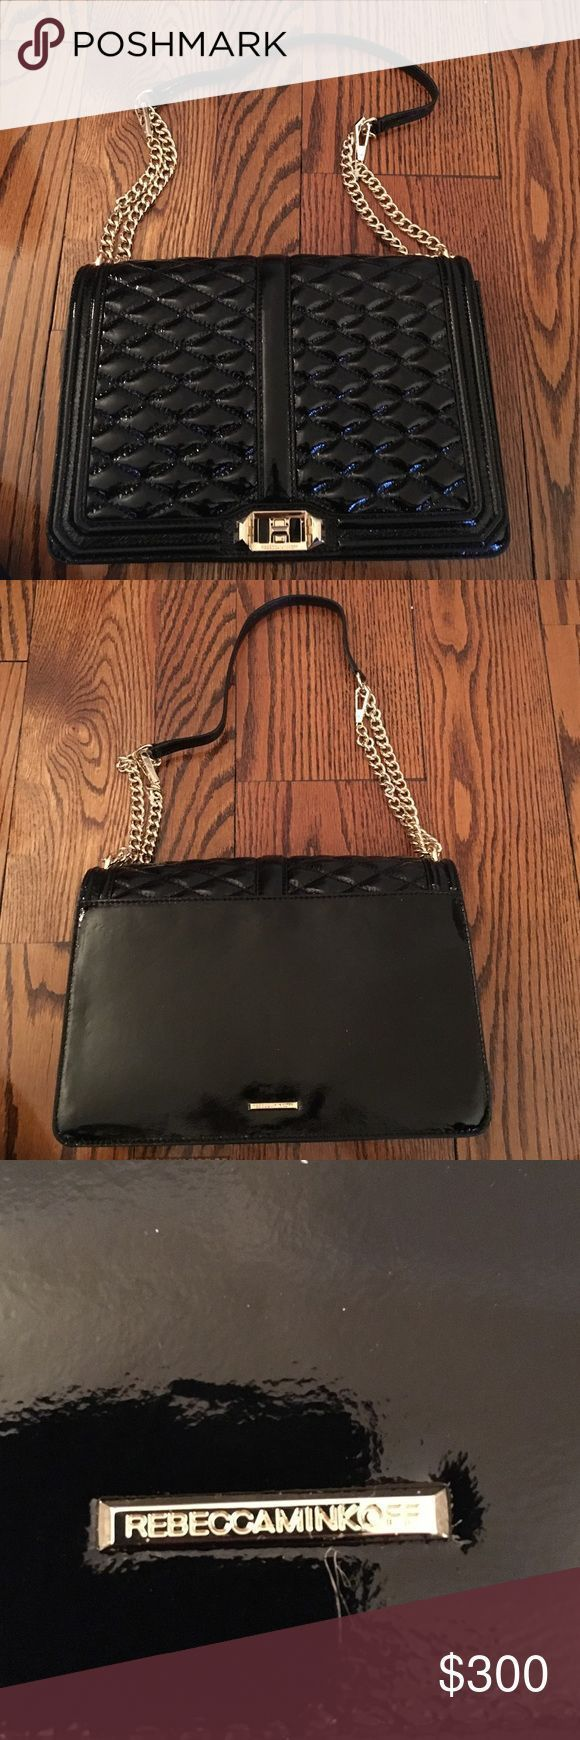 Rebecca Minkoff Quilted tote Brand new Rebecca Minkoff Quilted bag Rebecca Minkoff Bags Shoulder Bags